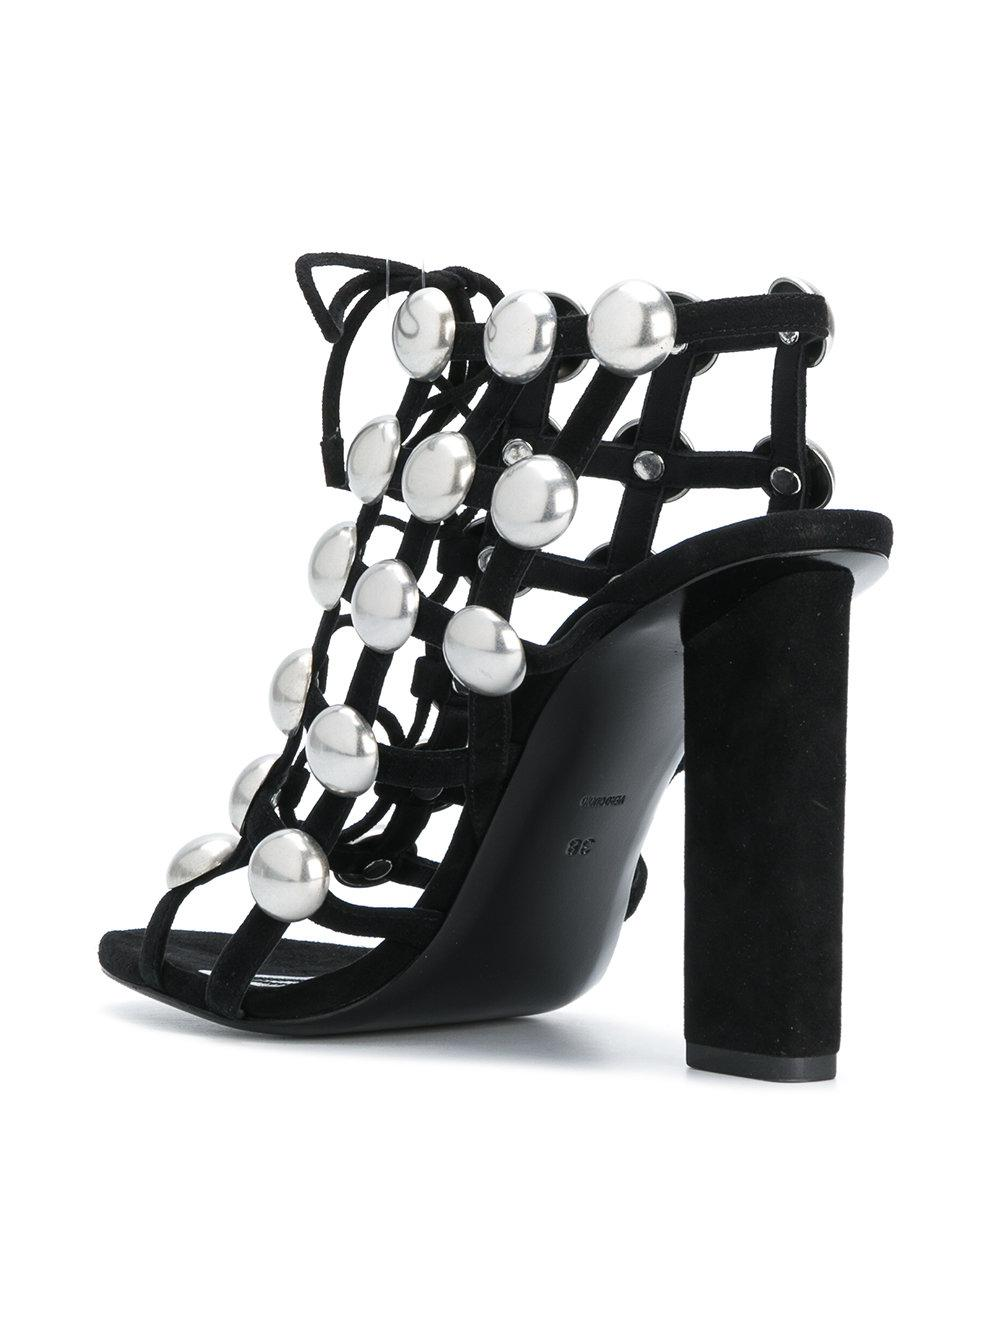 Cheap Sale For Sale Find Great Cheap Price Rubie sandals - Black Alexander Wang Discount Explore Free Shipping Cheapest Shop Sale Online q4Cbg